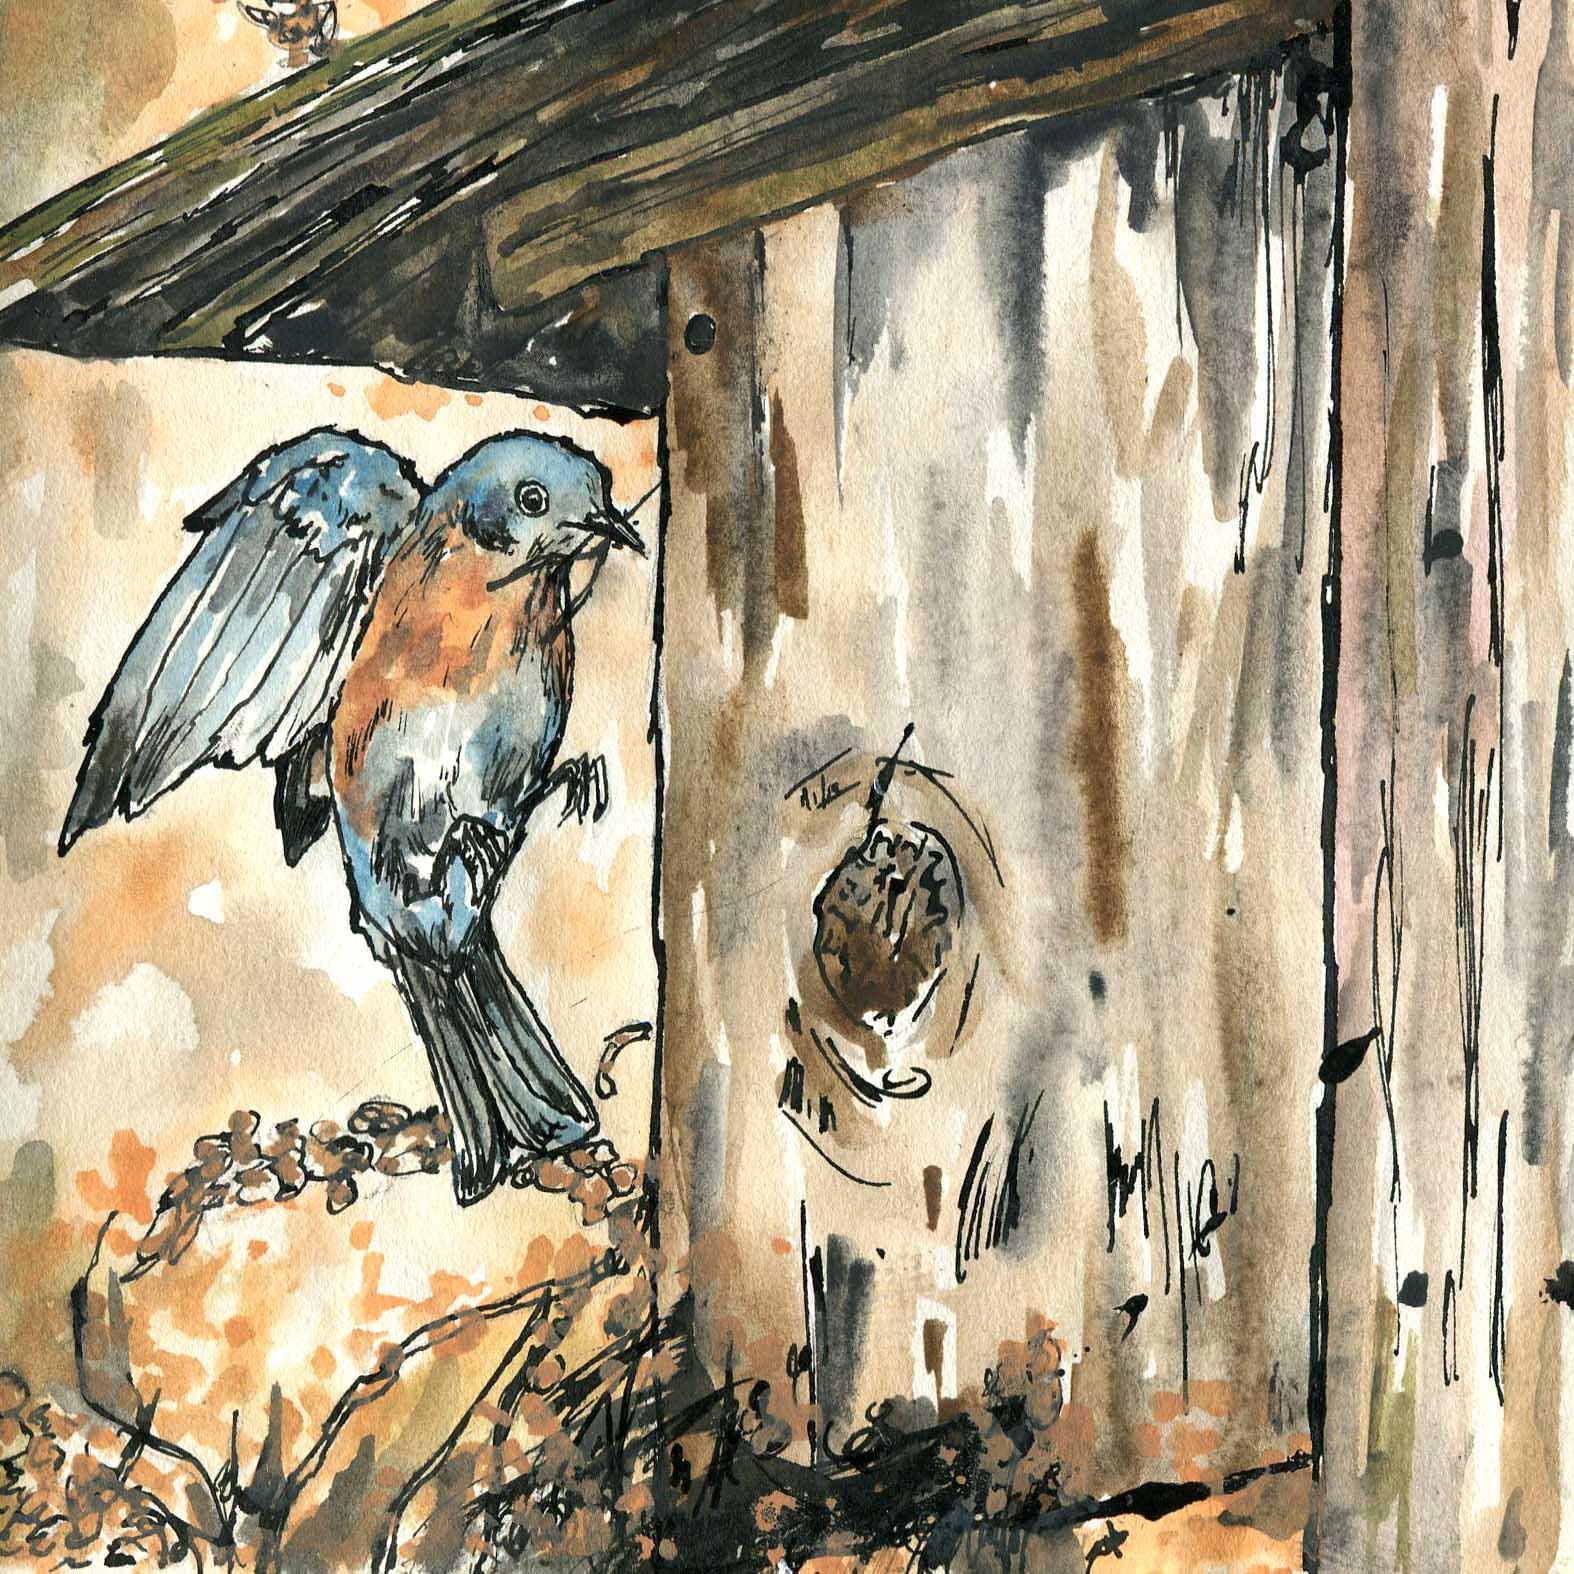 122. Eastern Bluebird